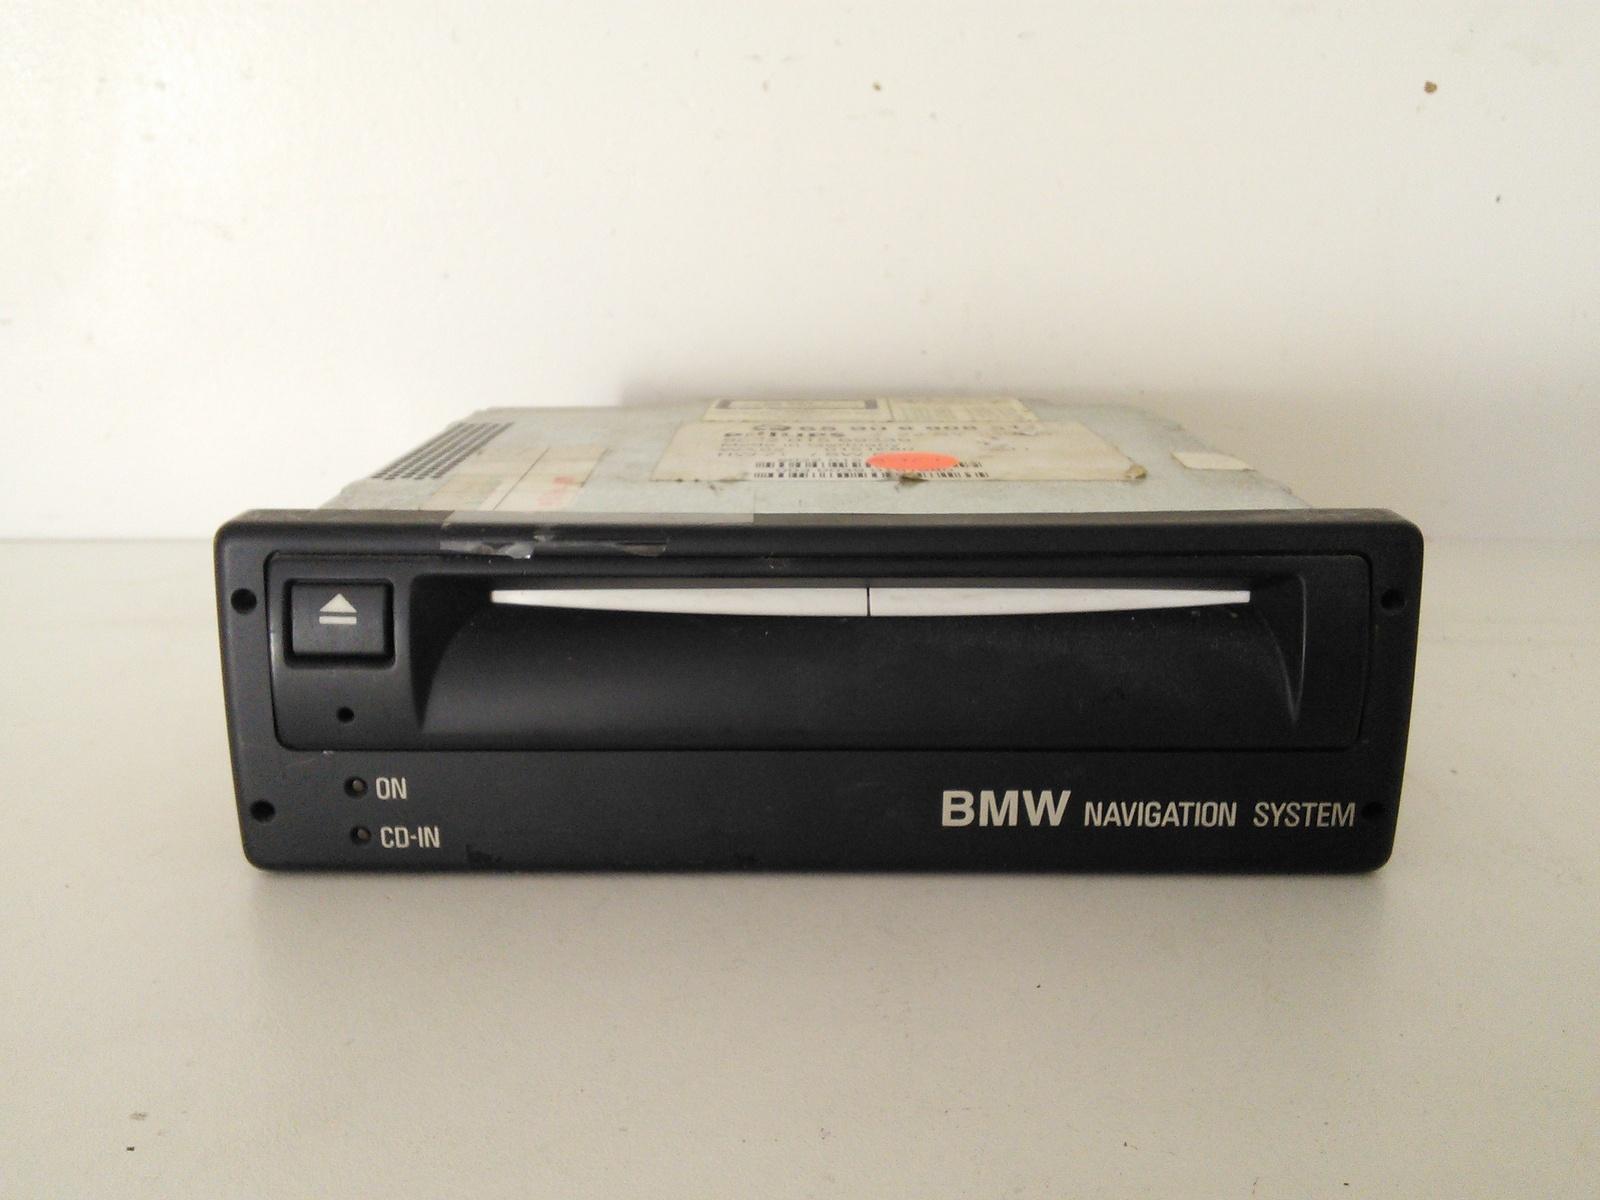 1995 2001 bmw mki remote navigation gps cd player philips drive 65906908311 audio in dash units. Black Bedroom Furniture Sets. Home Design Ideas